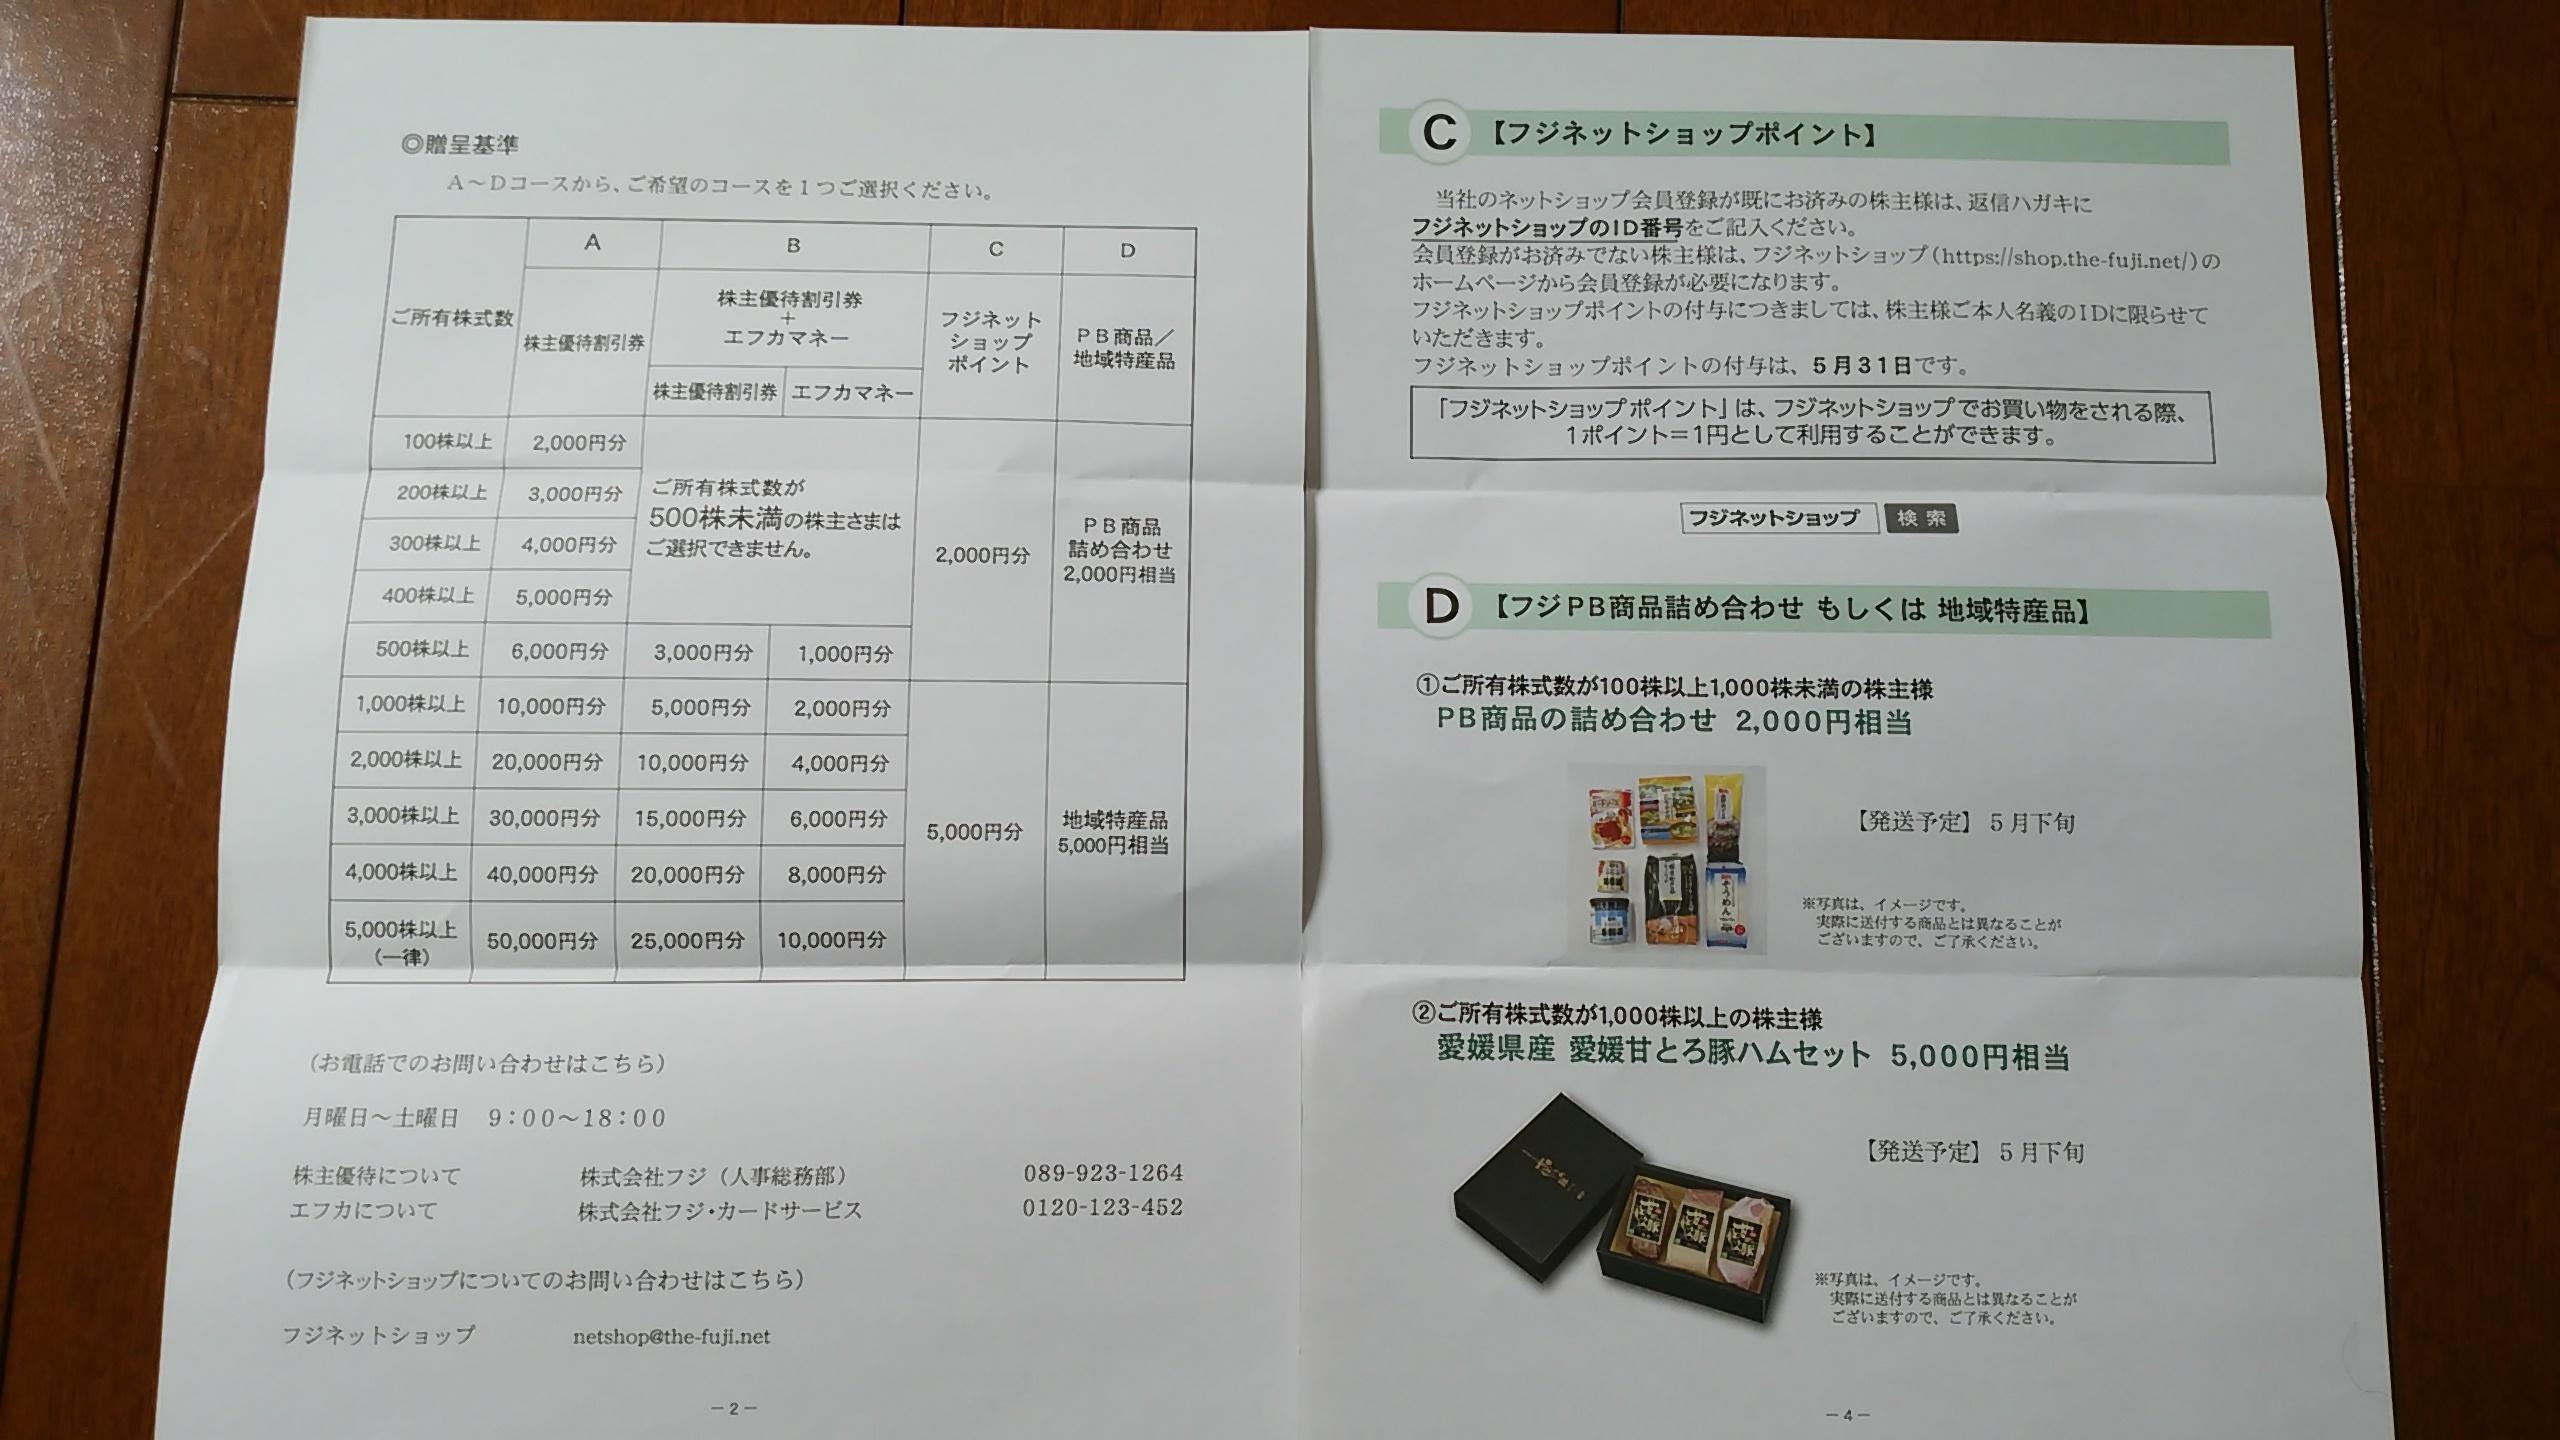 IMG_20210320_100234.jpg